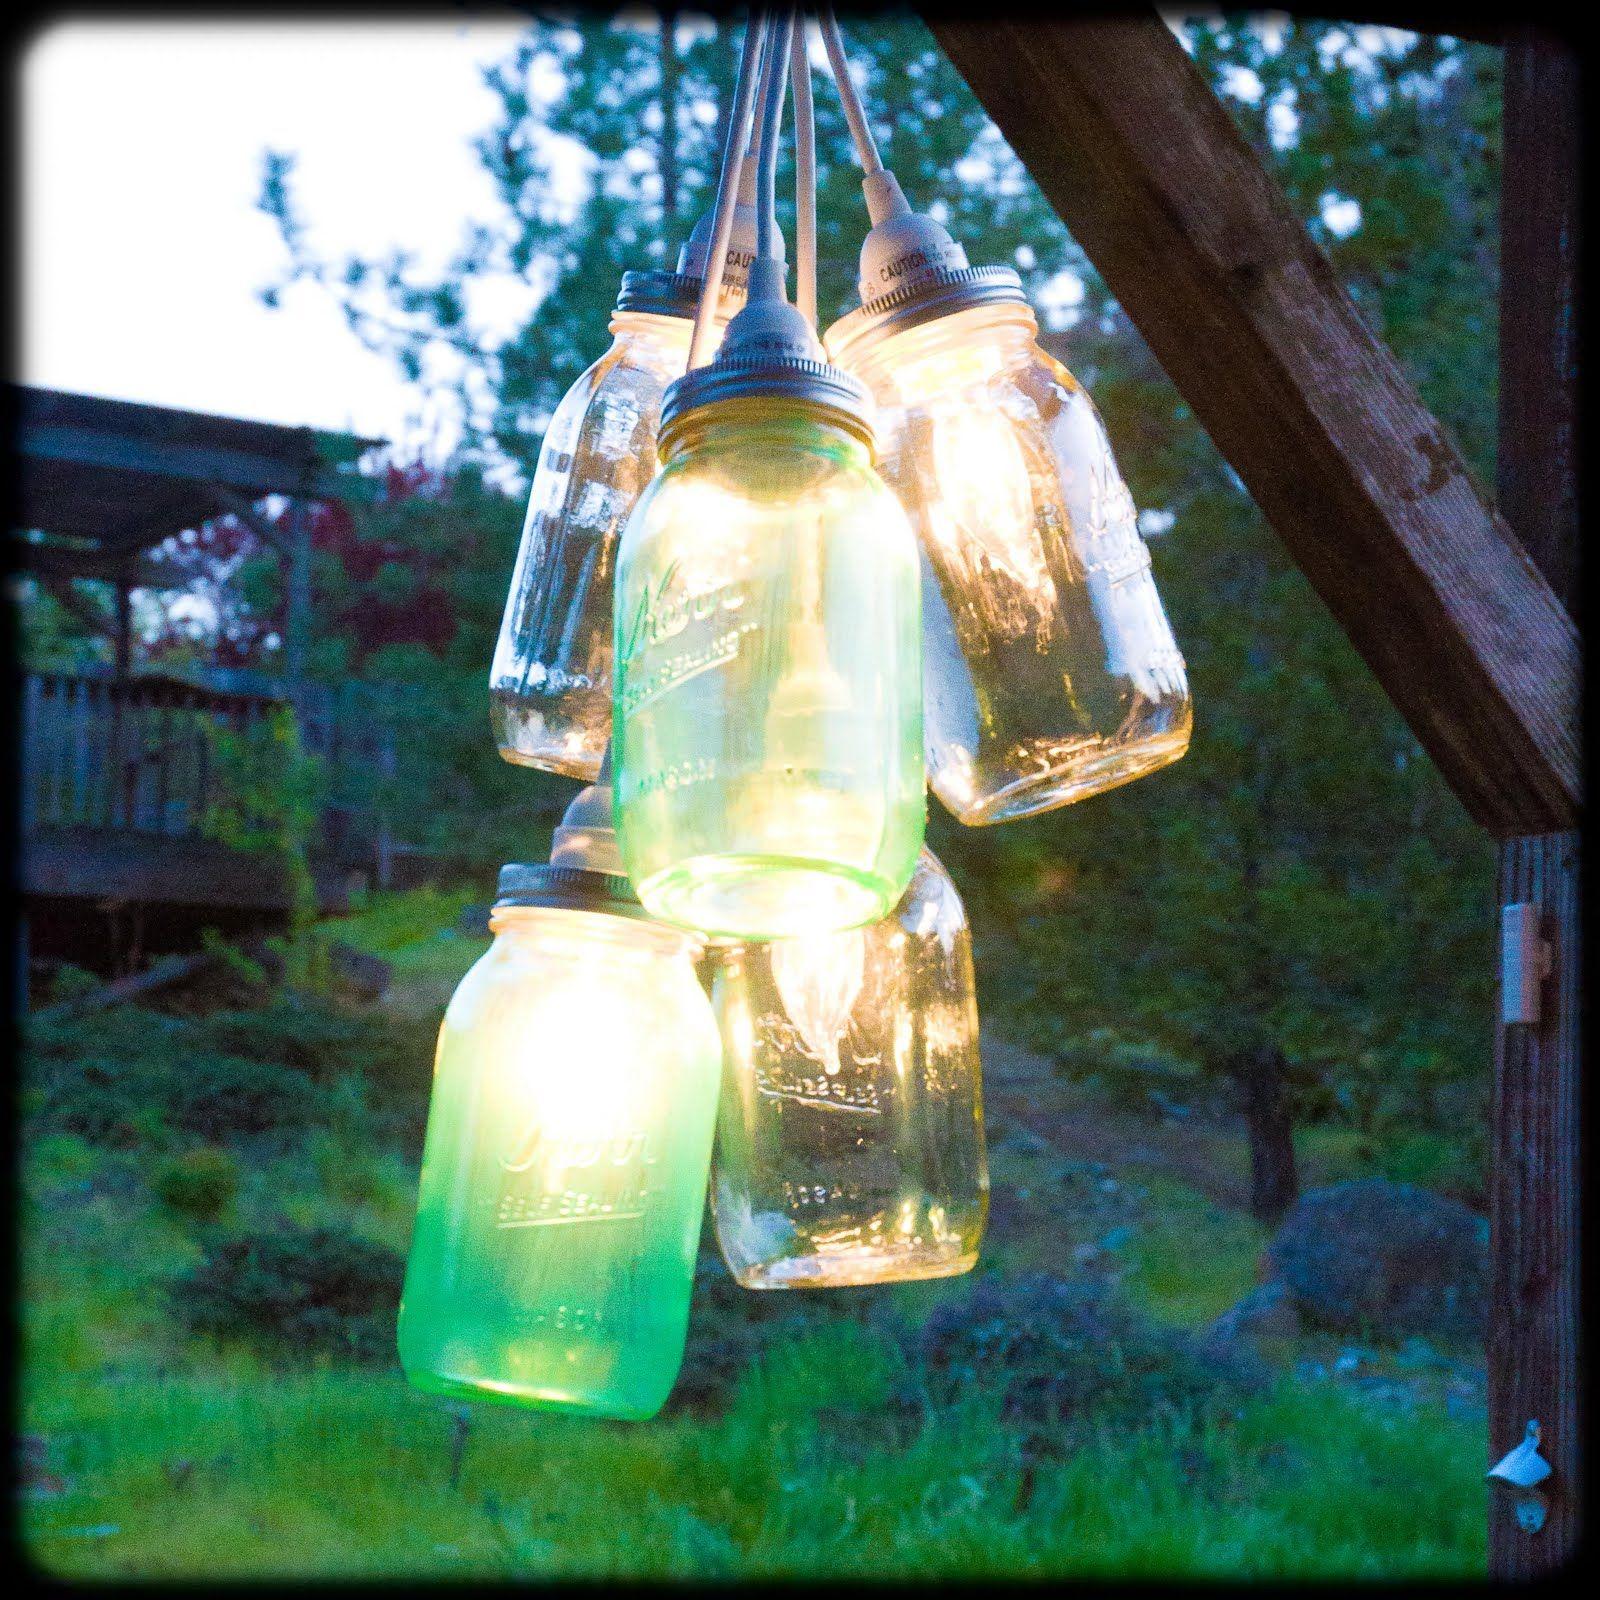 31 brilliant diy garden lighting ideas u2013 page 6 u2013 listinspired com